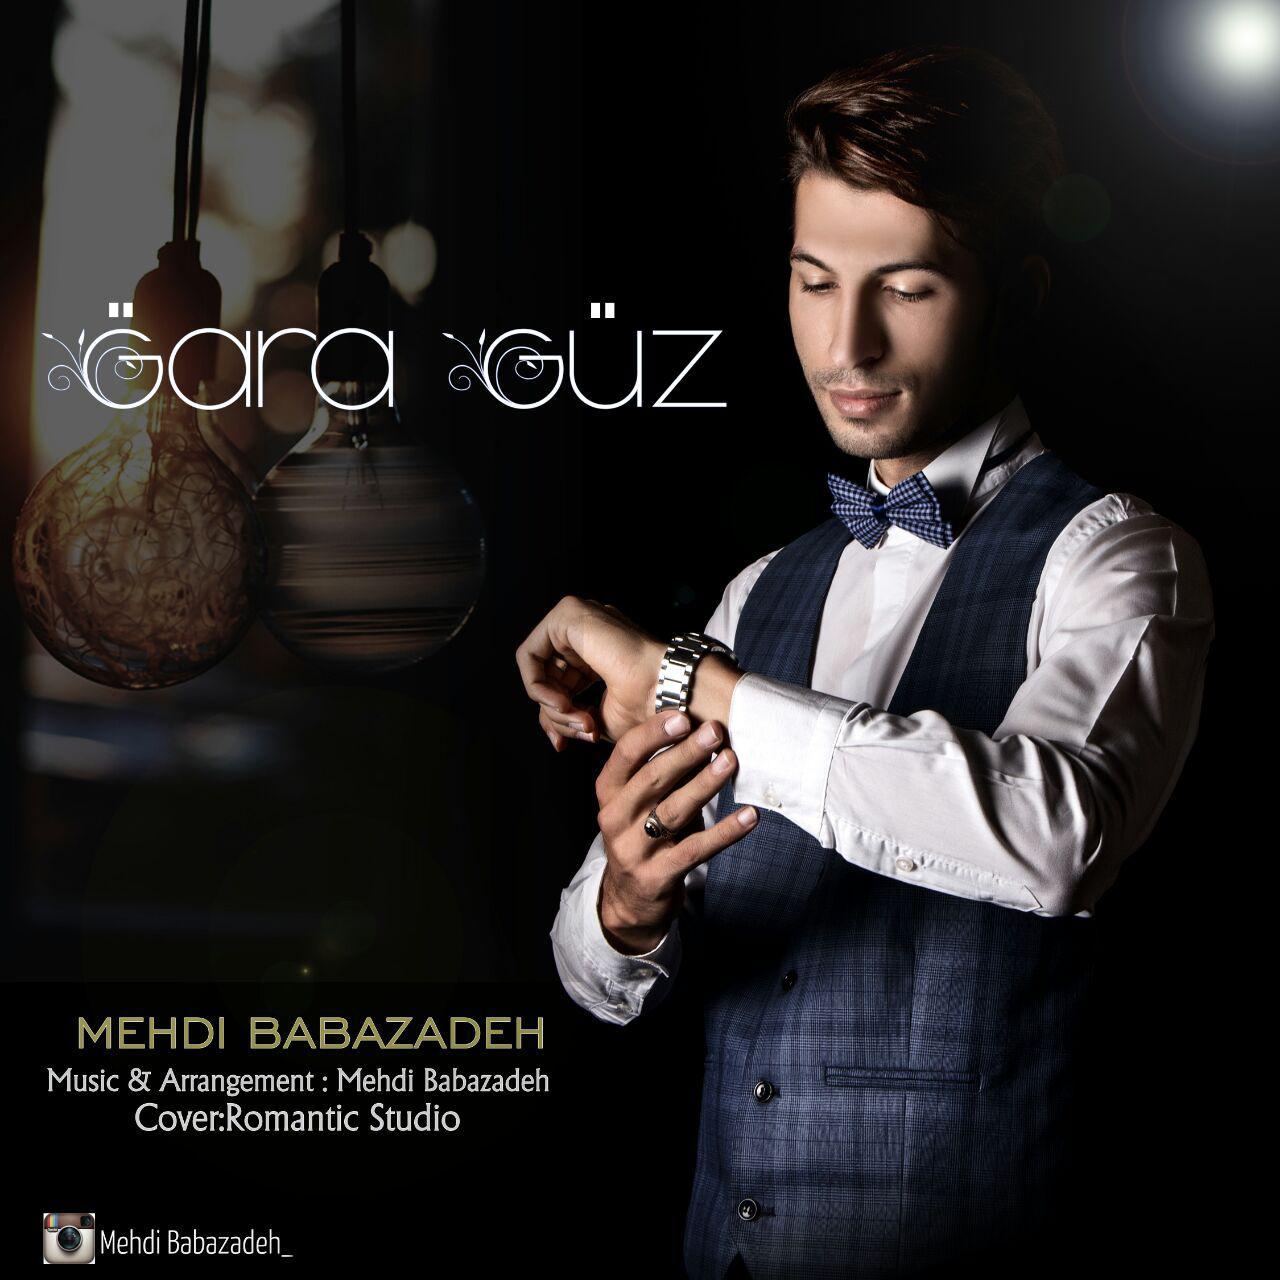 http://s9.picofile.com/file/8303918084/Mehdi_Babazadeh_Garagoz.jpg